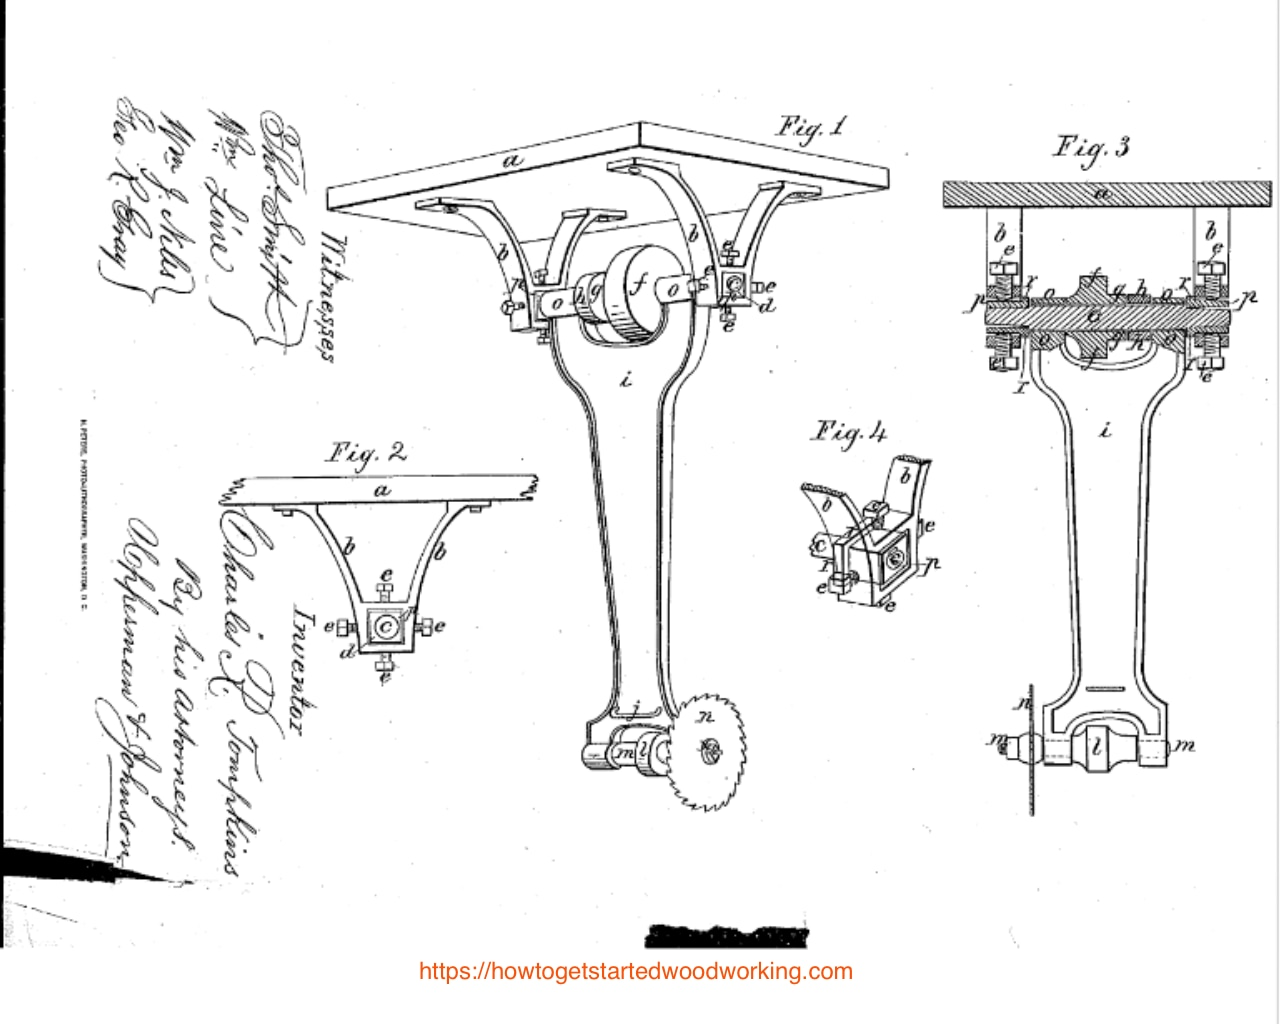 C.R. Tompkins hanging Saws